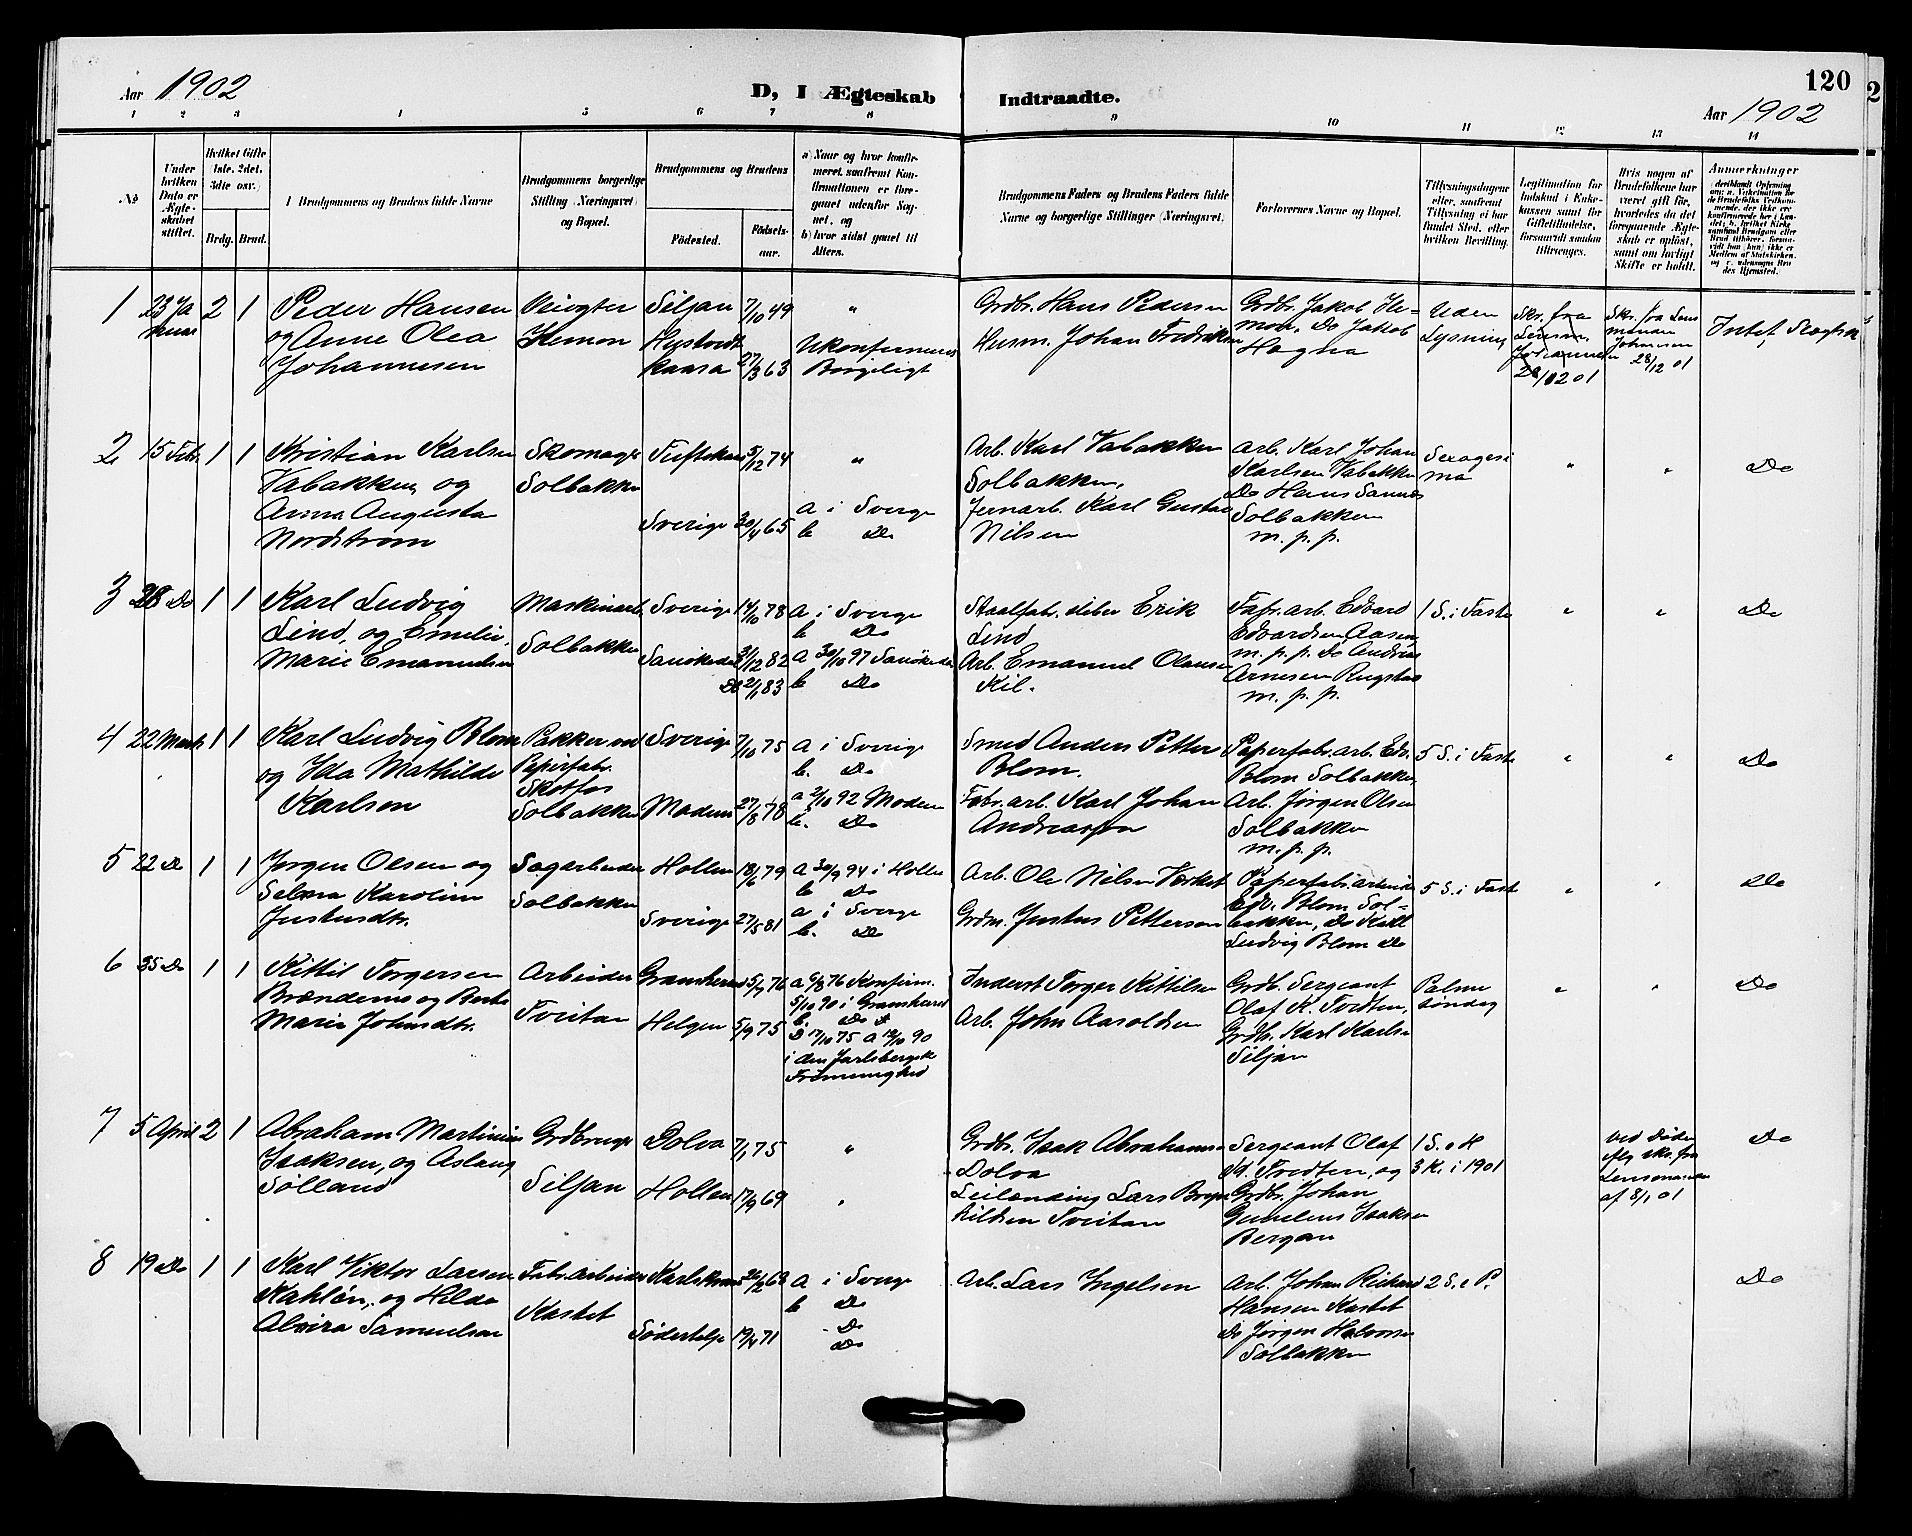 SAKO, Solum kirkebøker, G/Gb/L0004: Klokkerbok nr. II 4, 1898-1905, s. 120